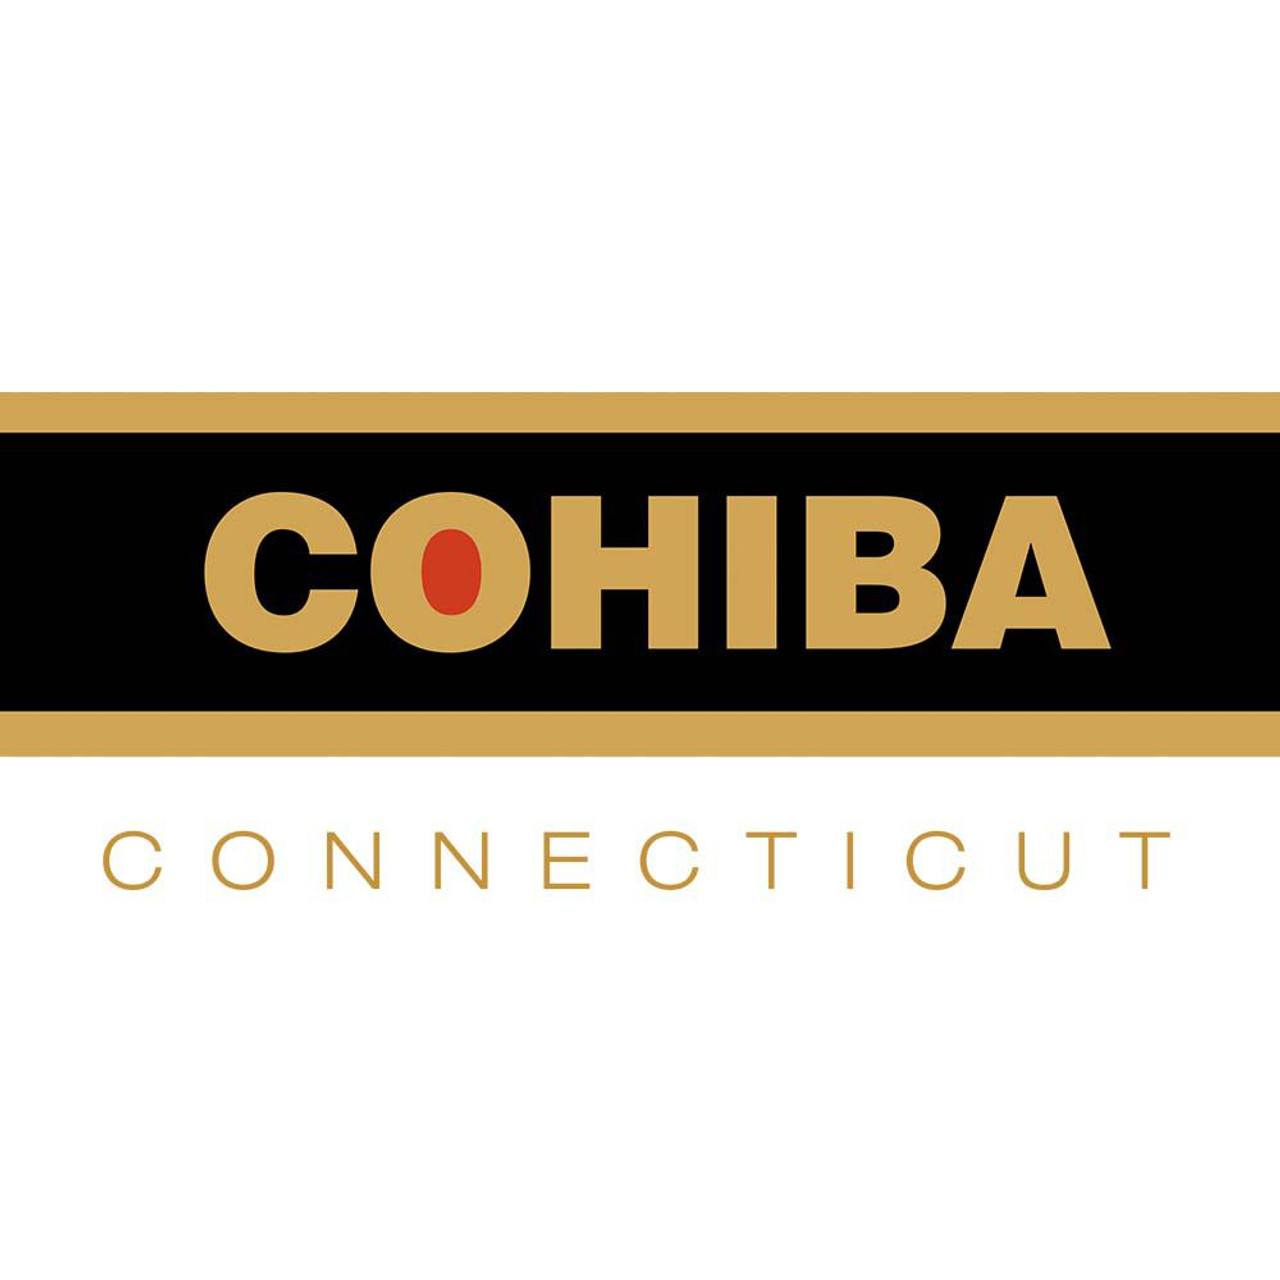 Cohiba Connecticut Robusto Tubo Cigars - 5.0 x 50 (Box of 10)